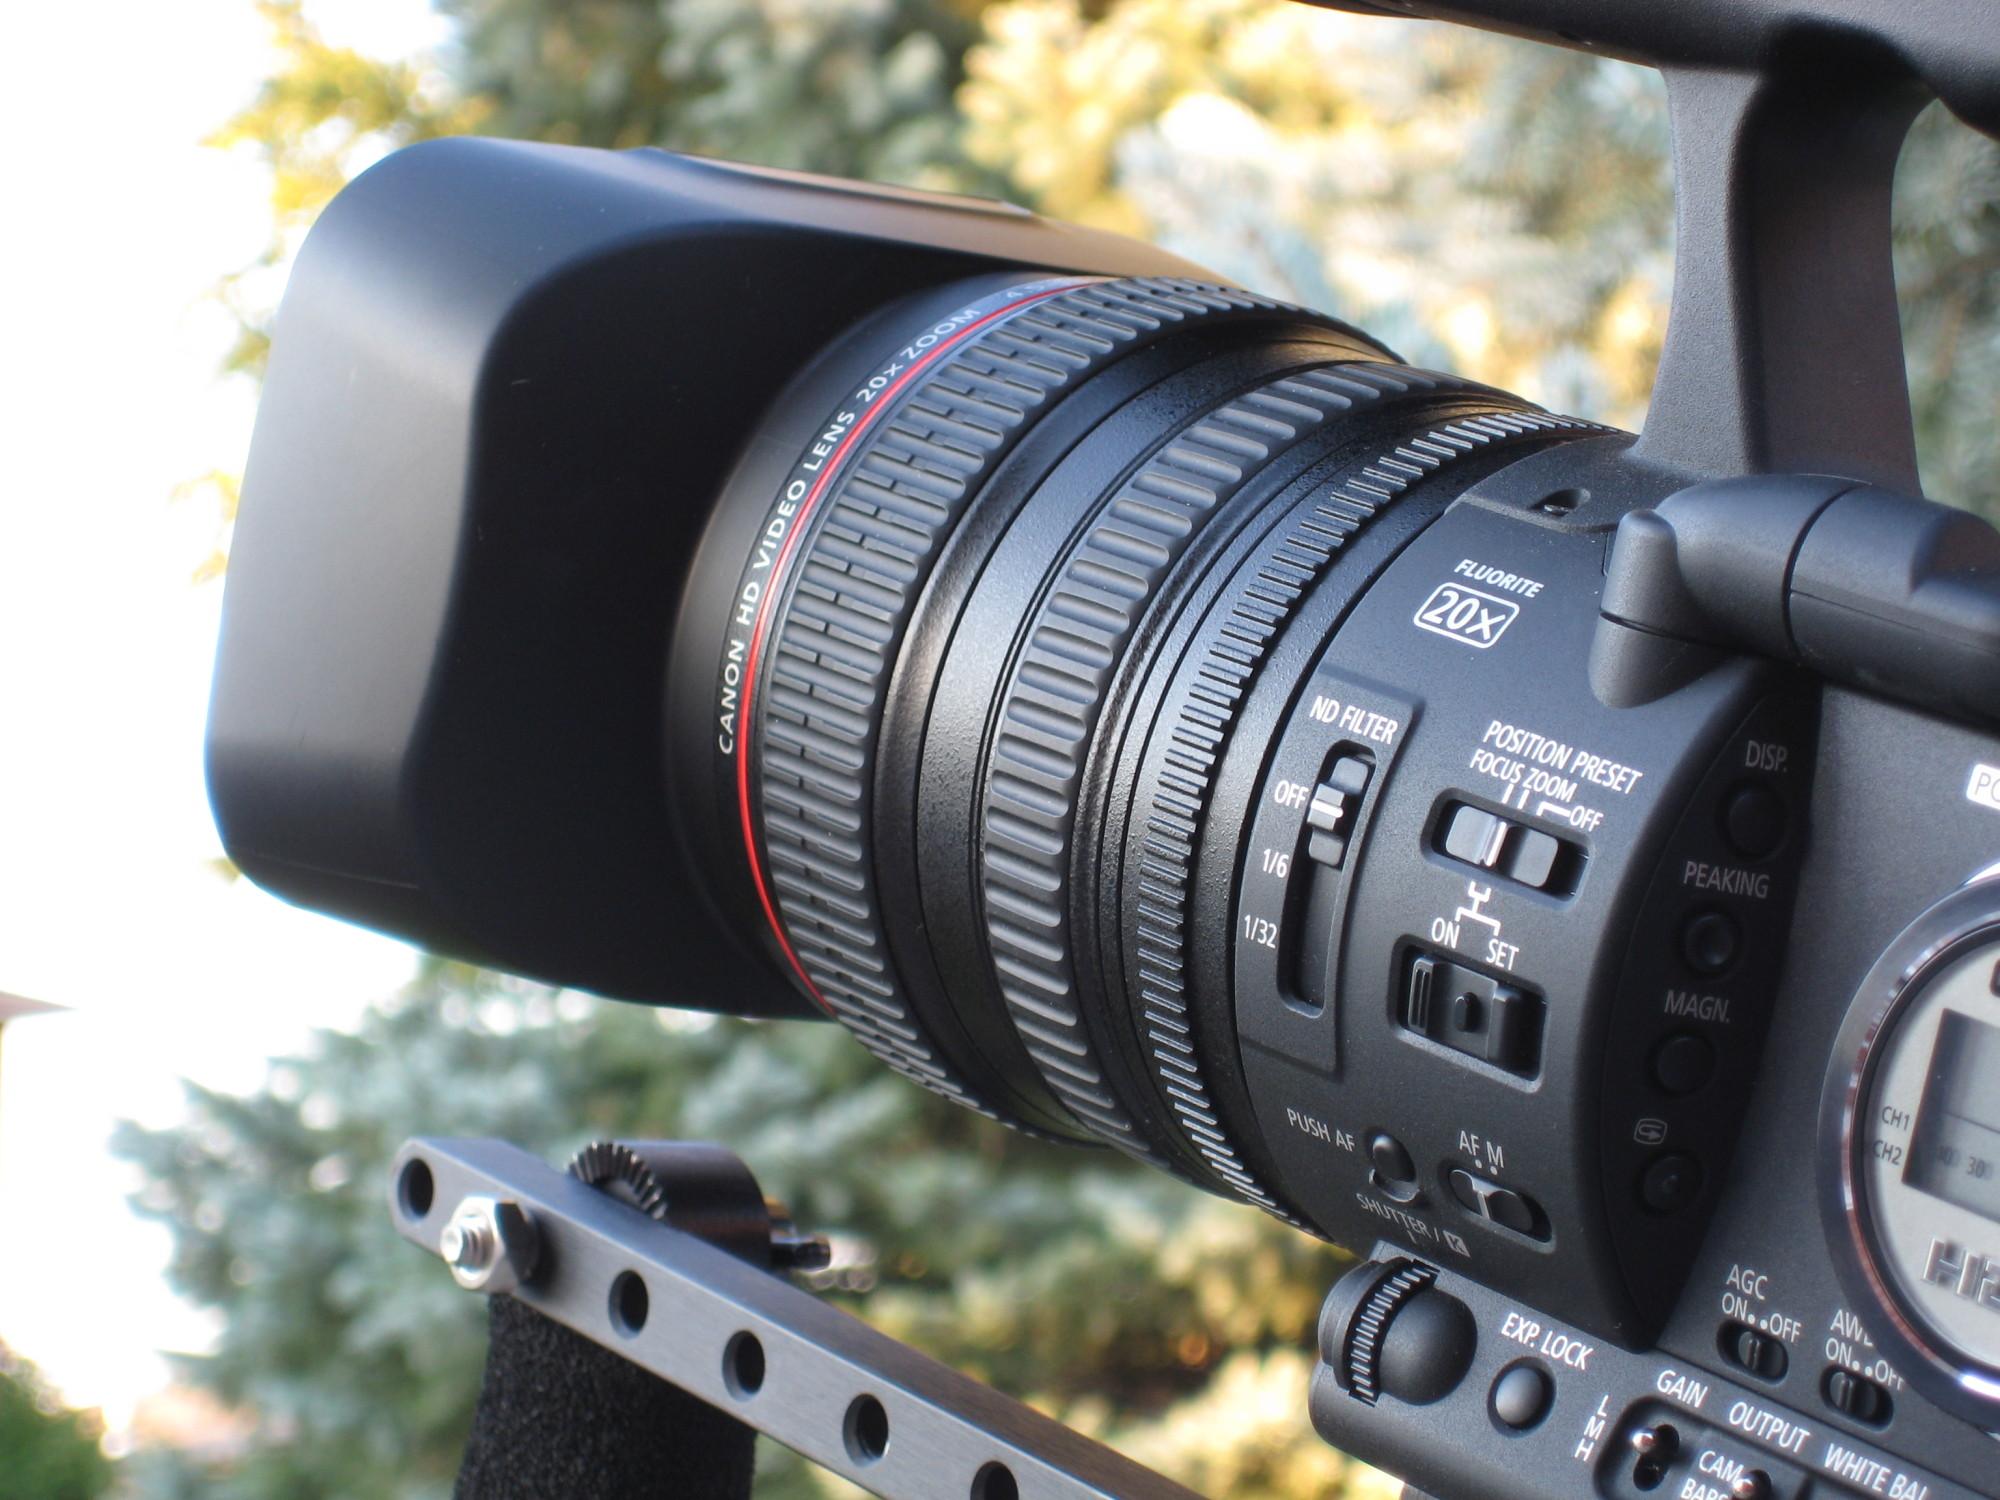 Canon_XH-A1_optics_closeup_72mmlense_and_rings